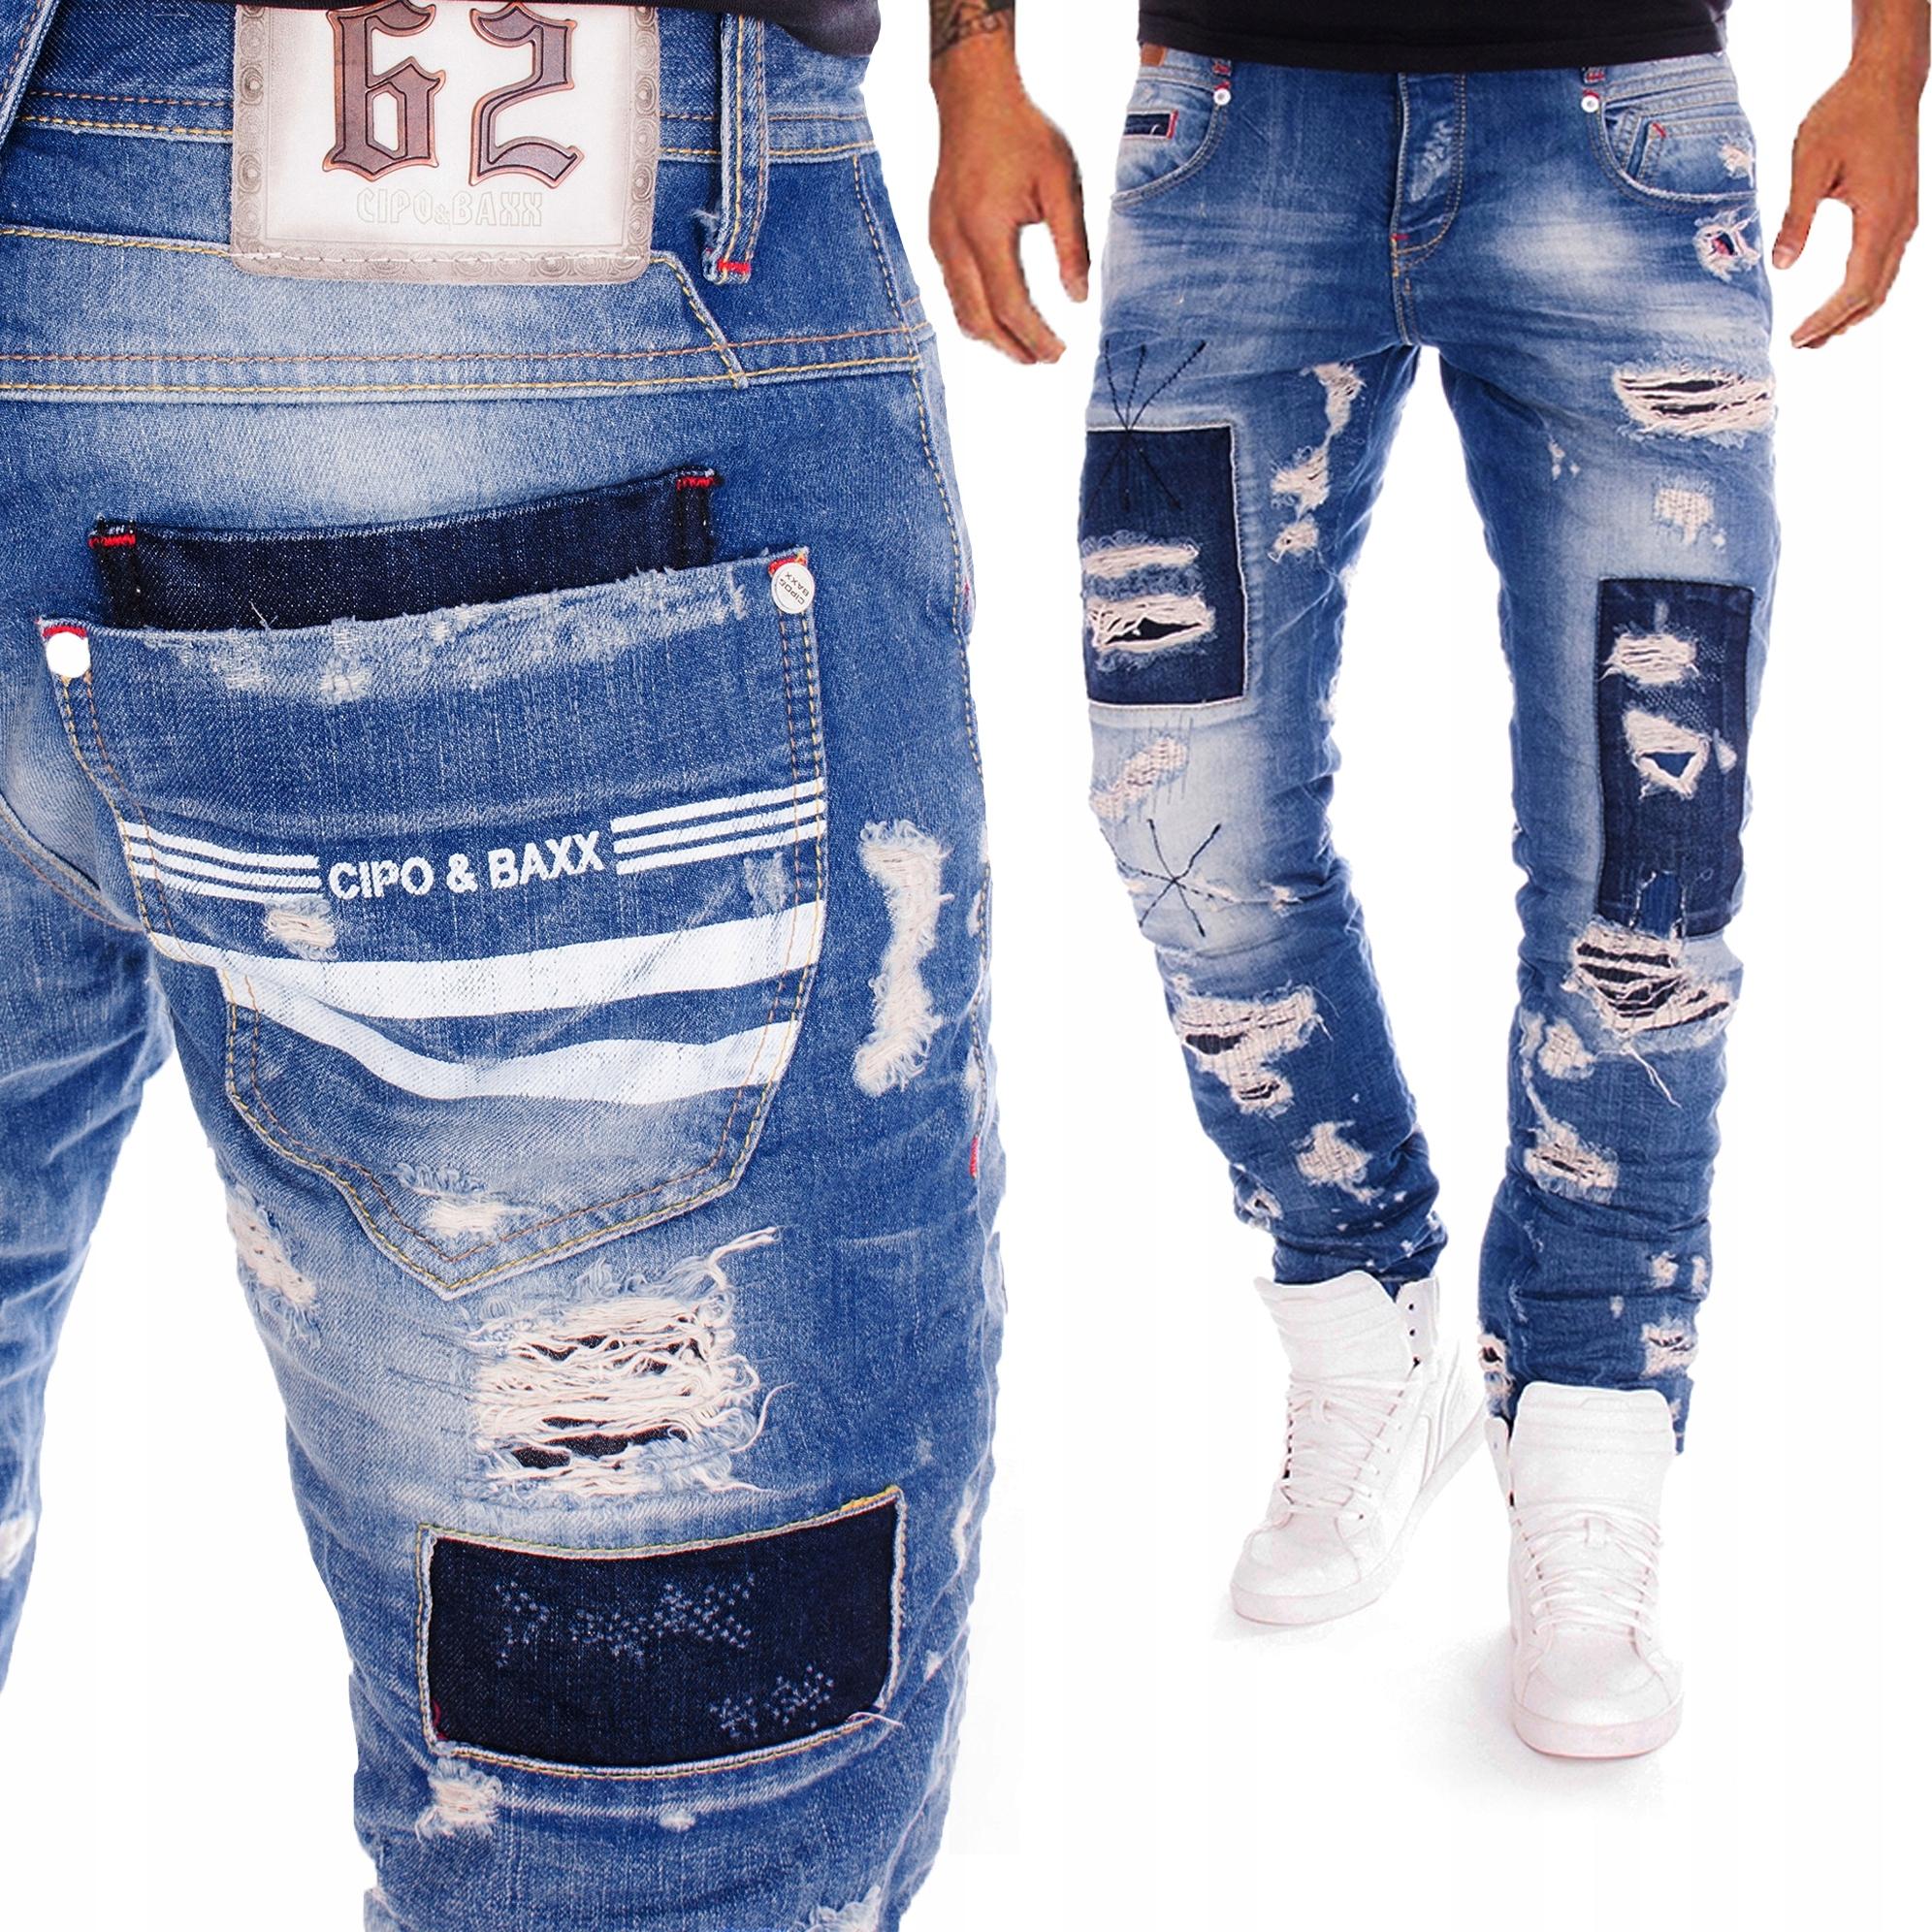 Spodnie Cipo Baxx Jeansy Męskie Street Style